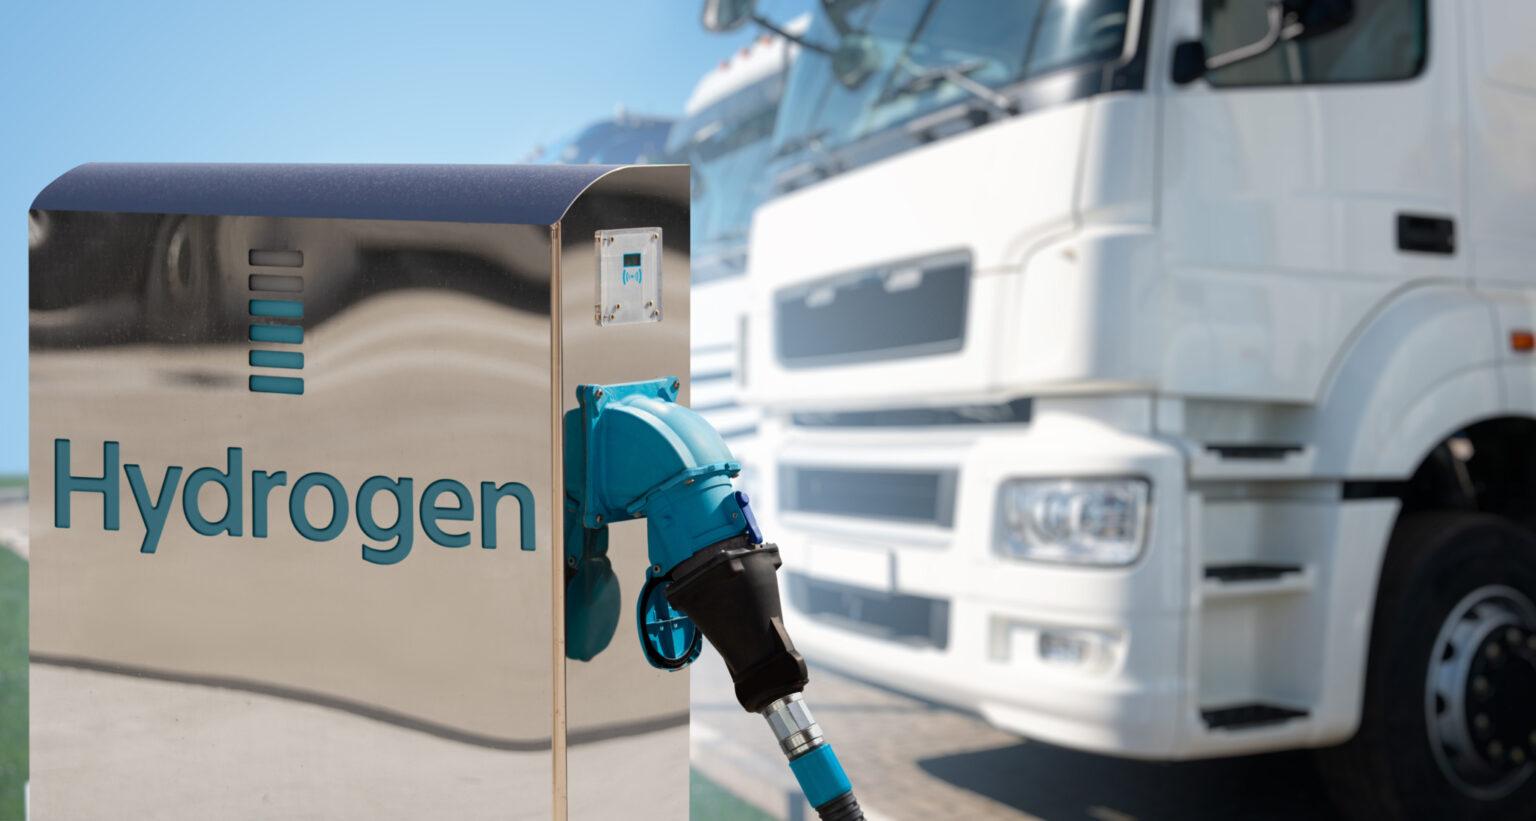 Trucknews: Ottawa invests in Alberta hydrogen fueling station for trucks.